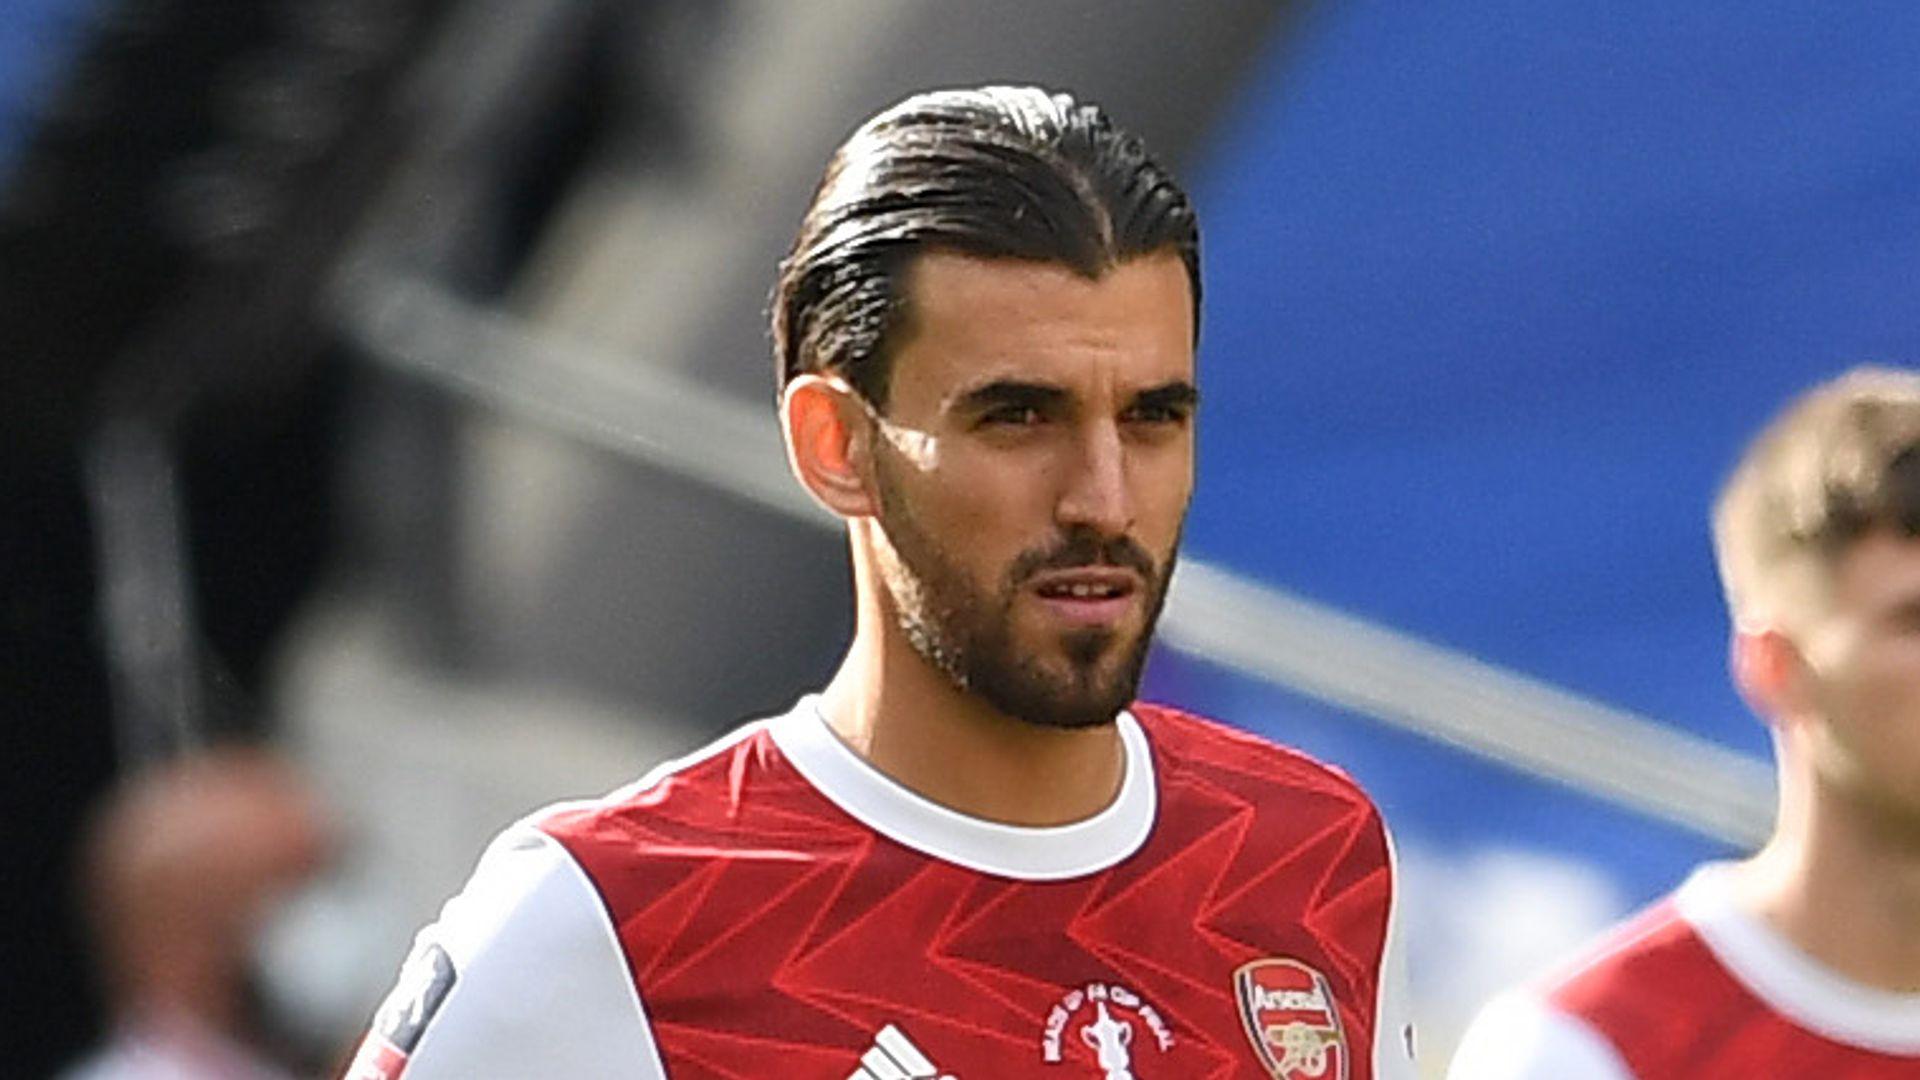 Arsenal re-sign Ceballos on loan